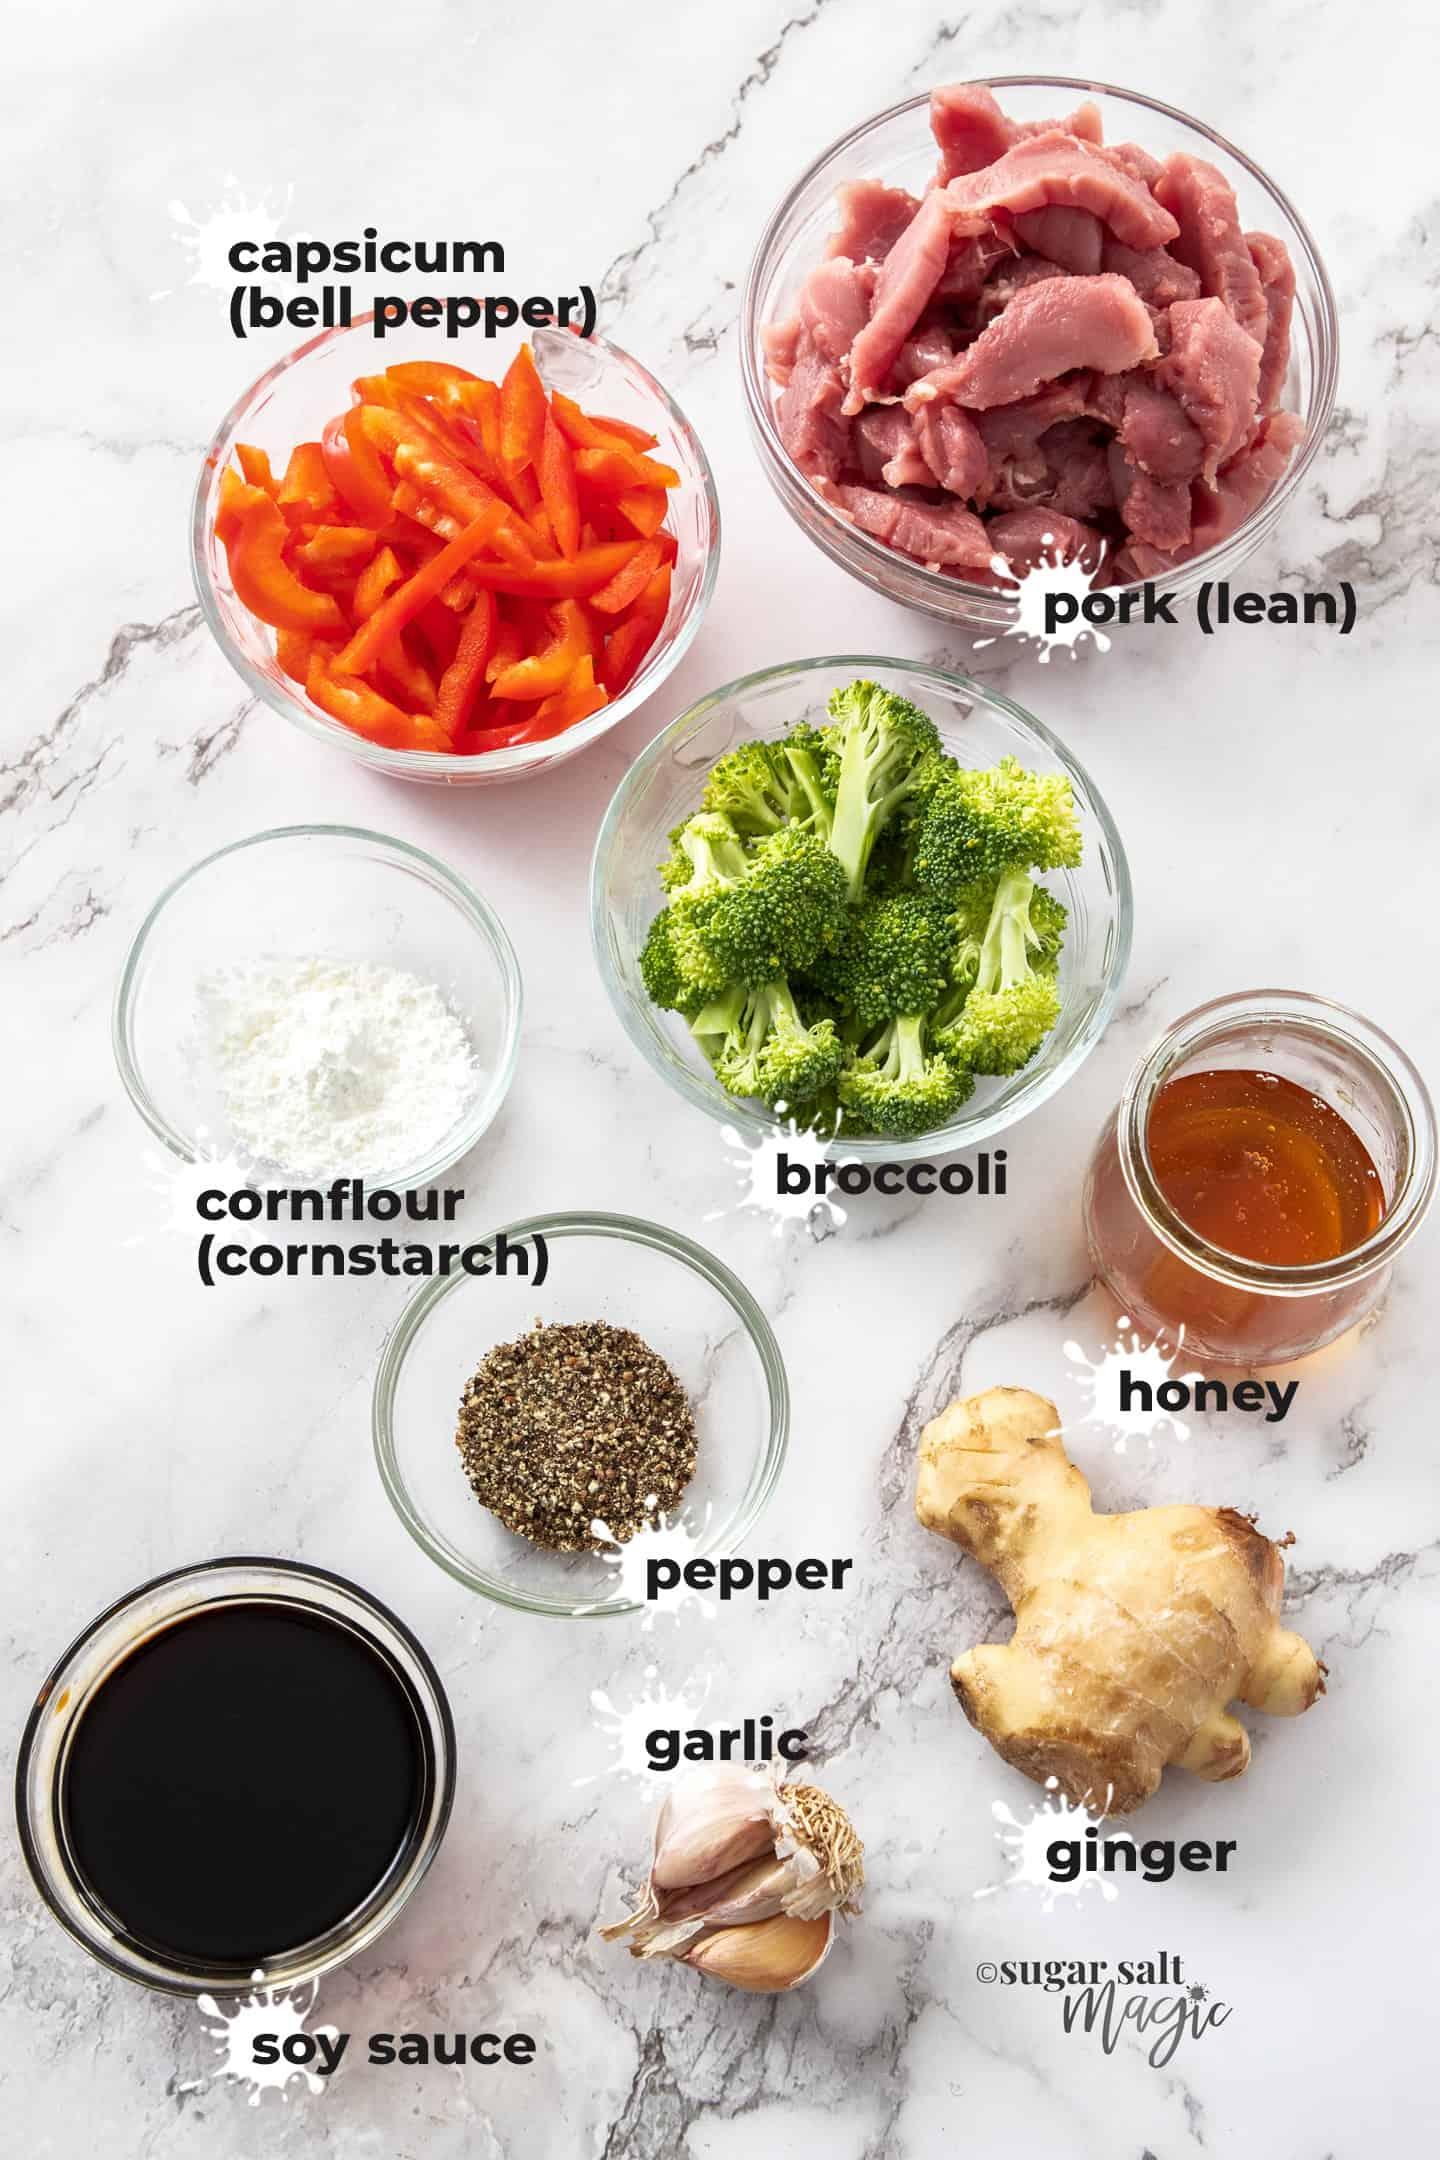 Ingredients for honey pepper pork stir fry on a marble background.